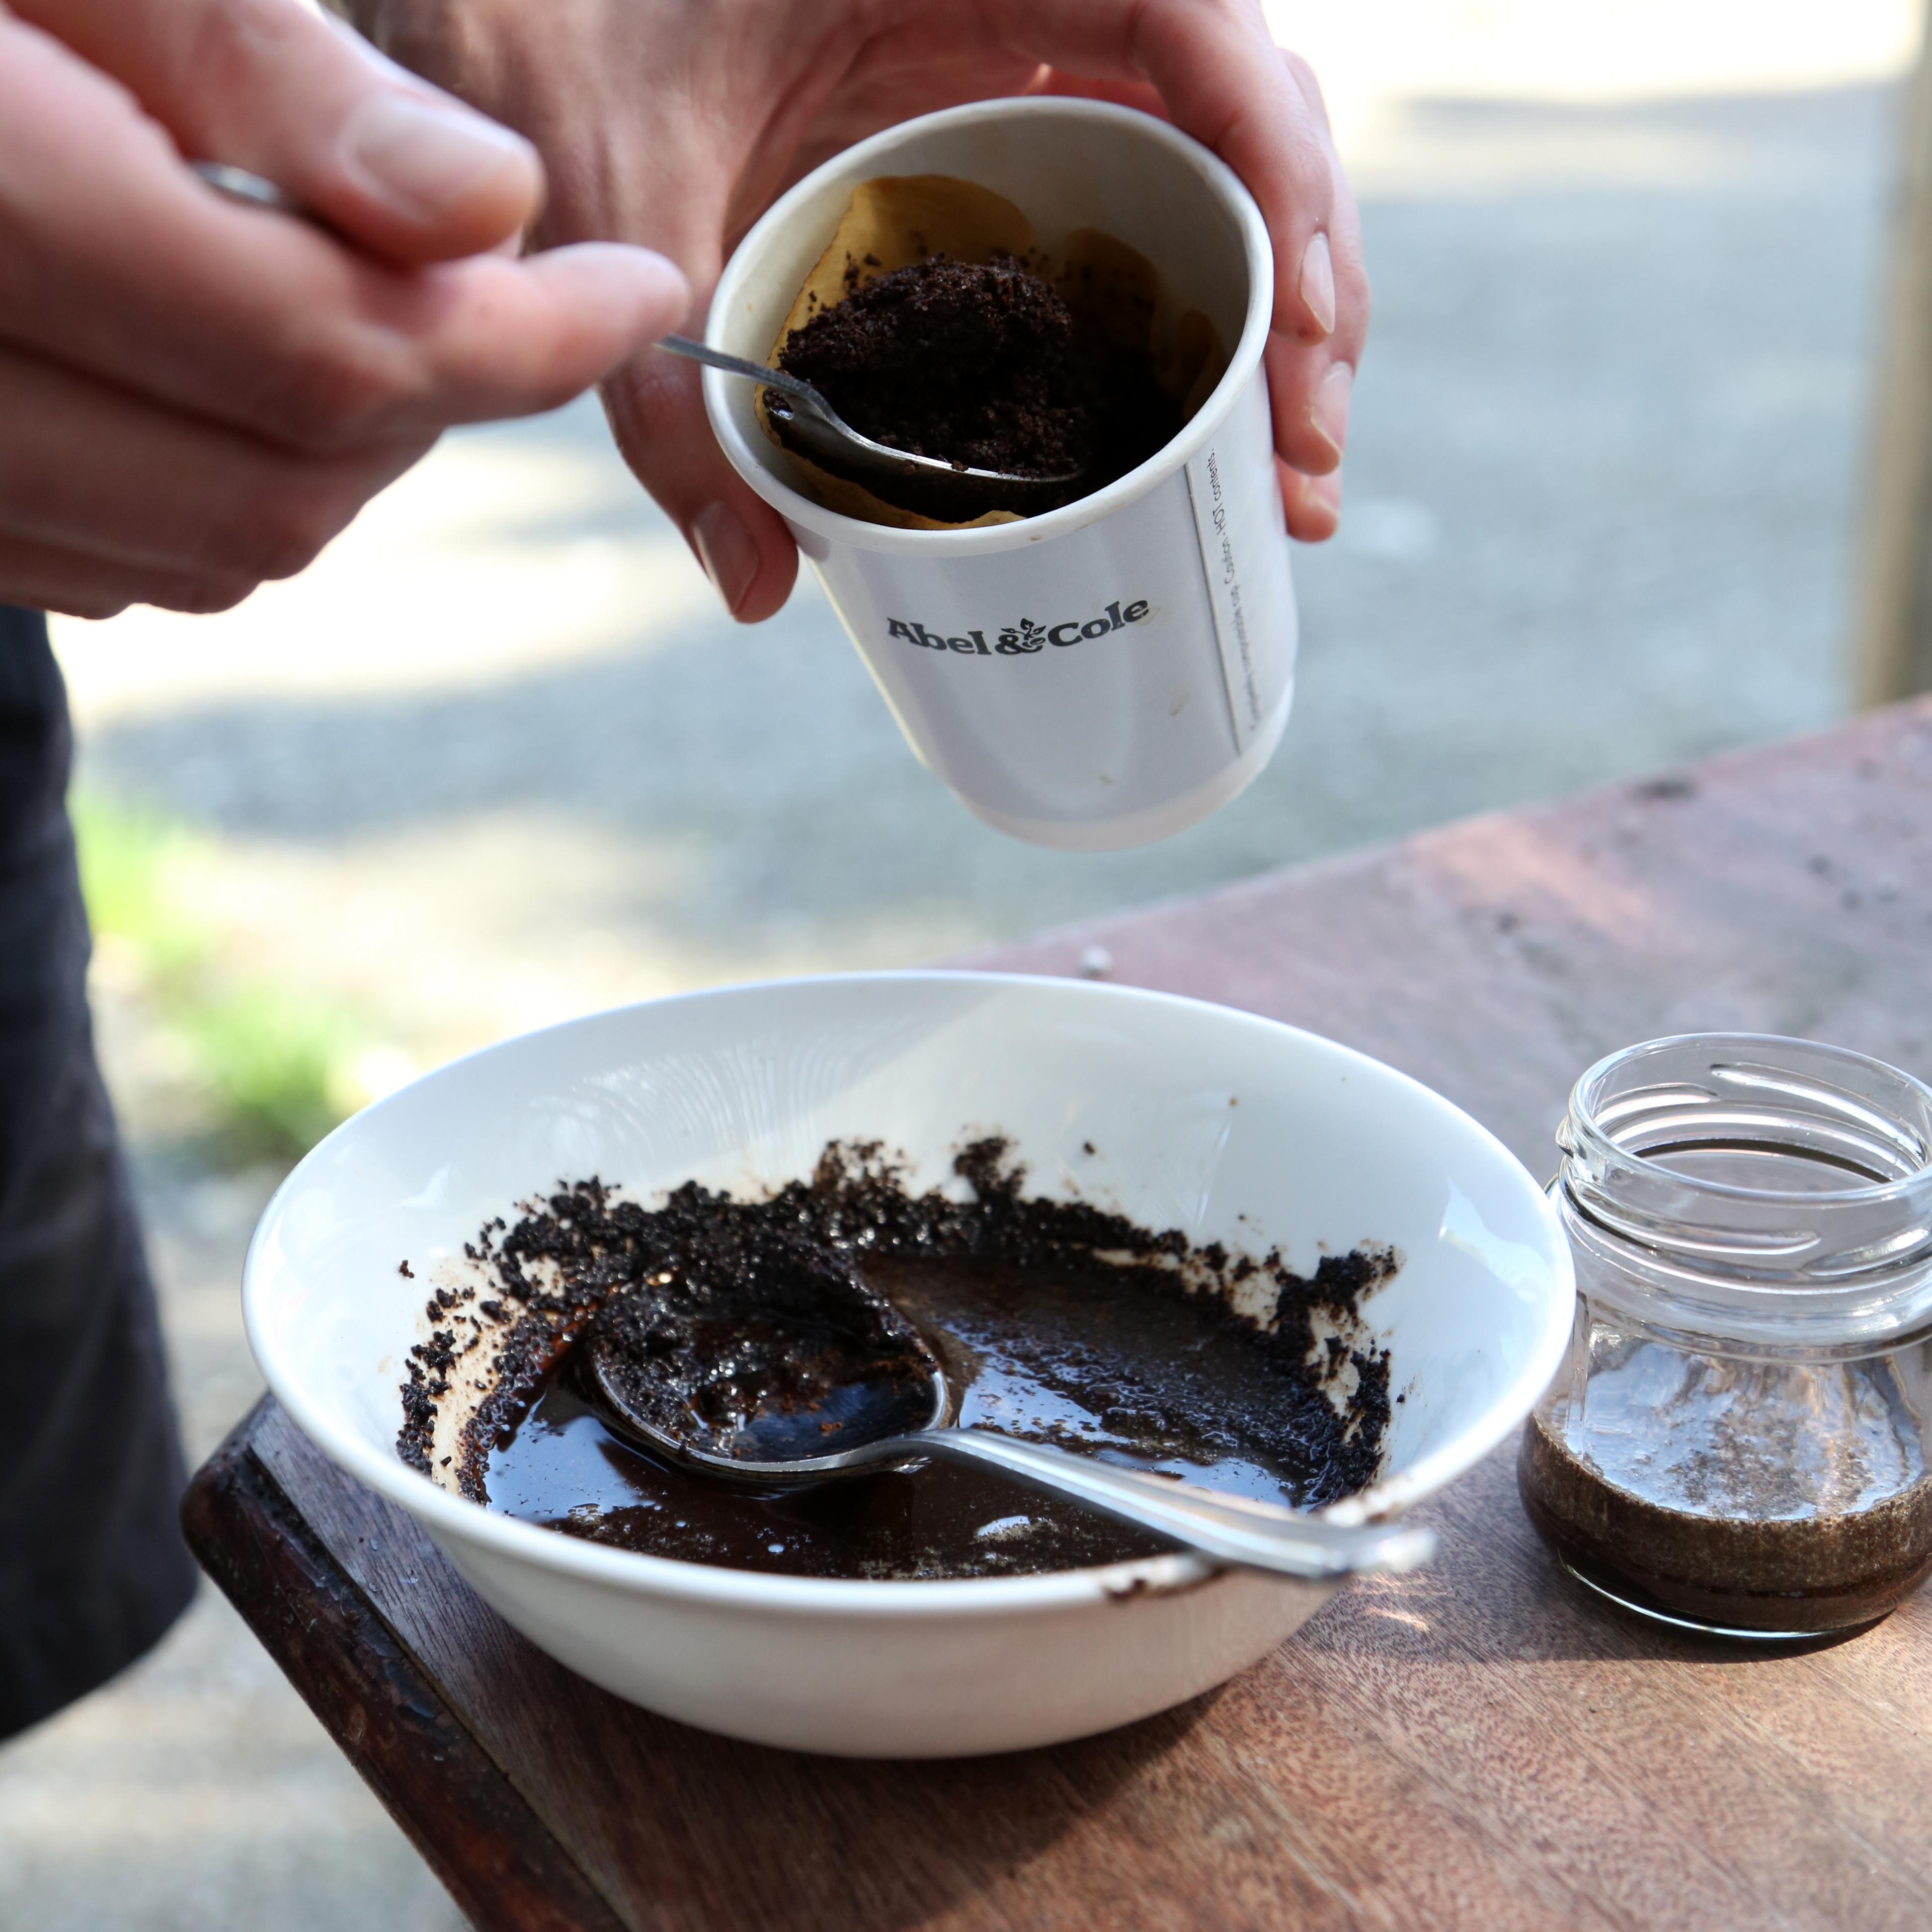 Honey and coffee scrub